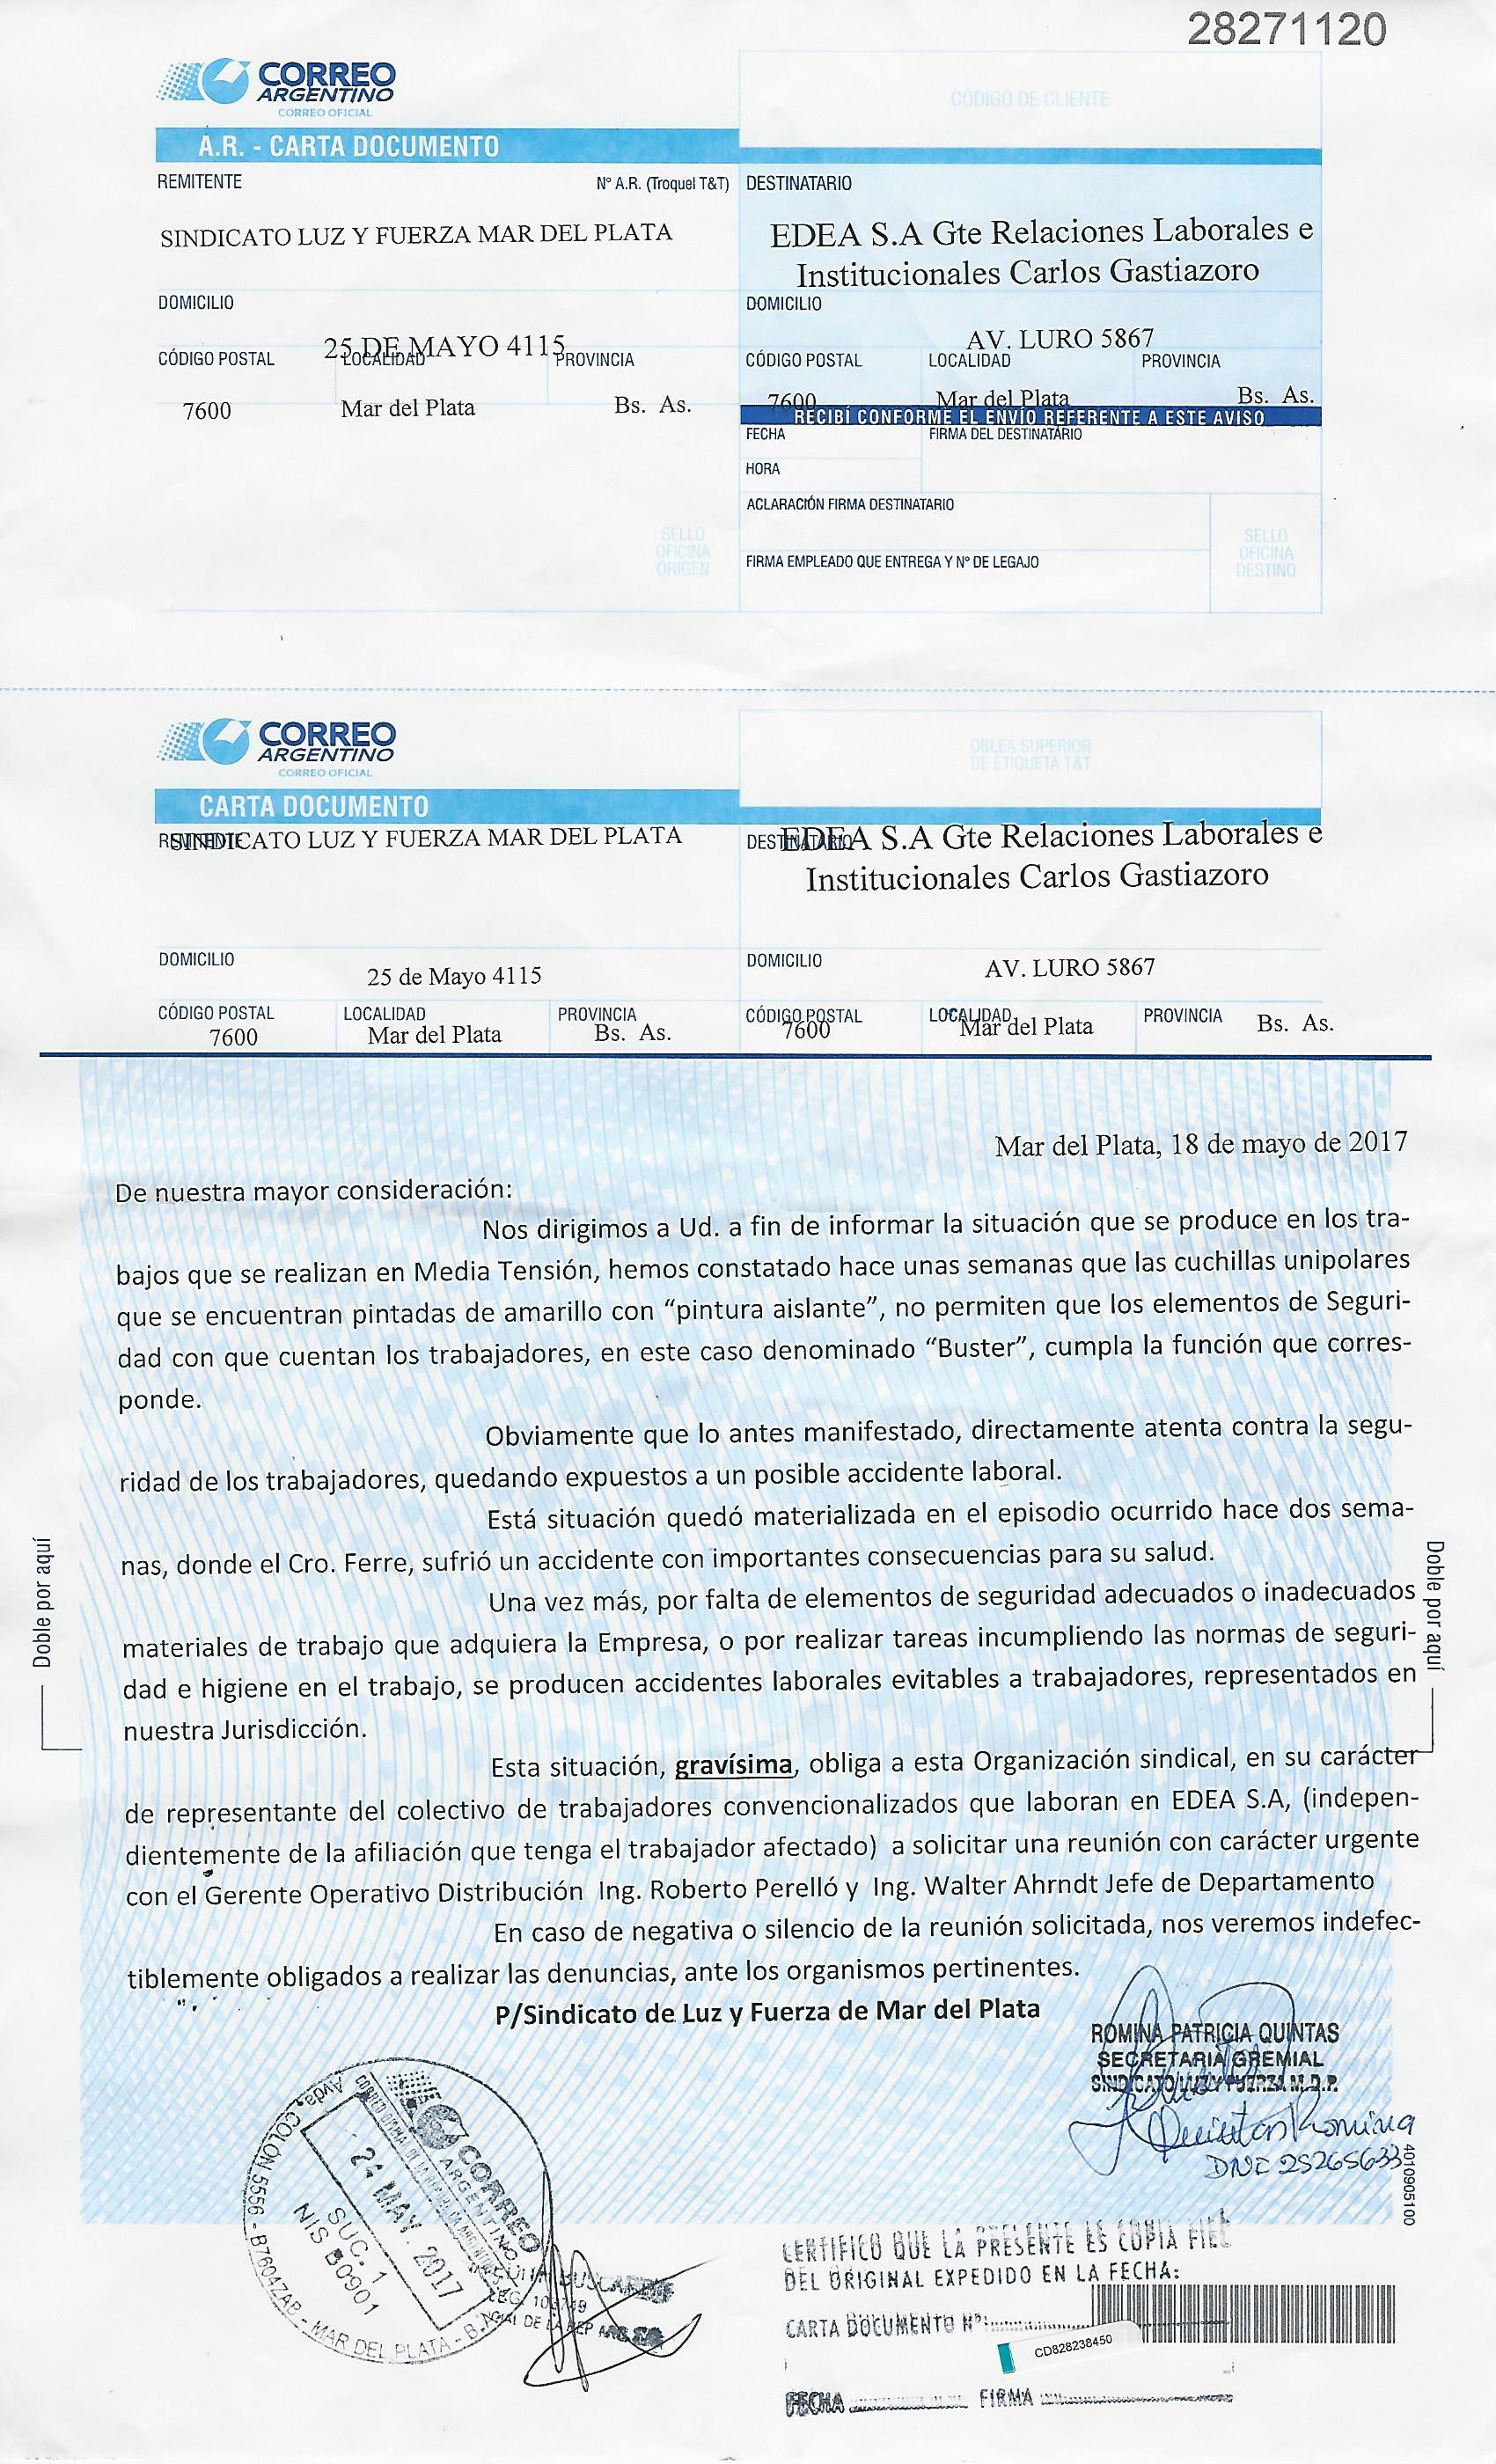 CARTA DOCUMENTO A EDEA S.A. POR SEGURIDAD LABORAL